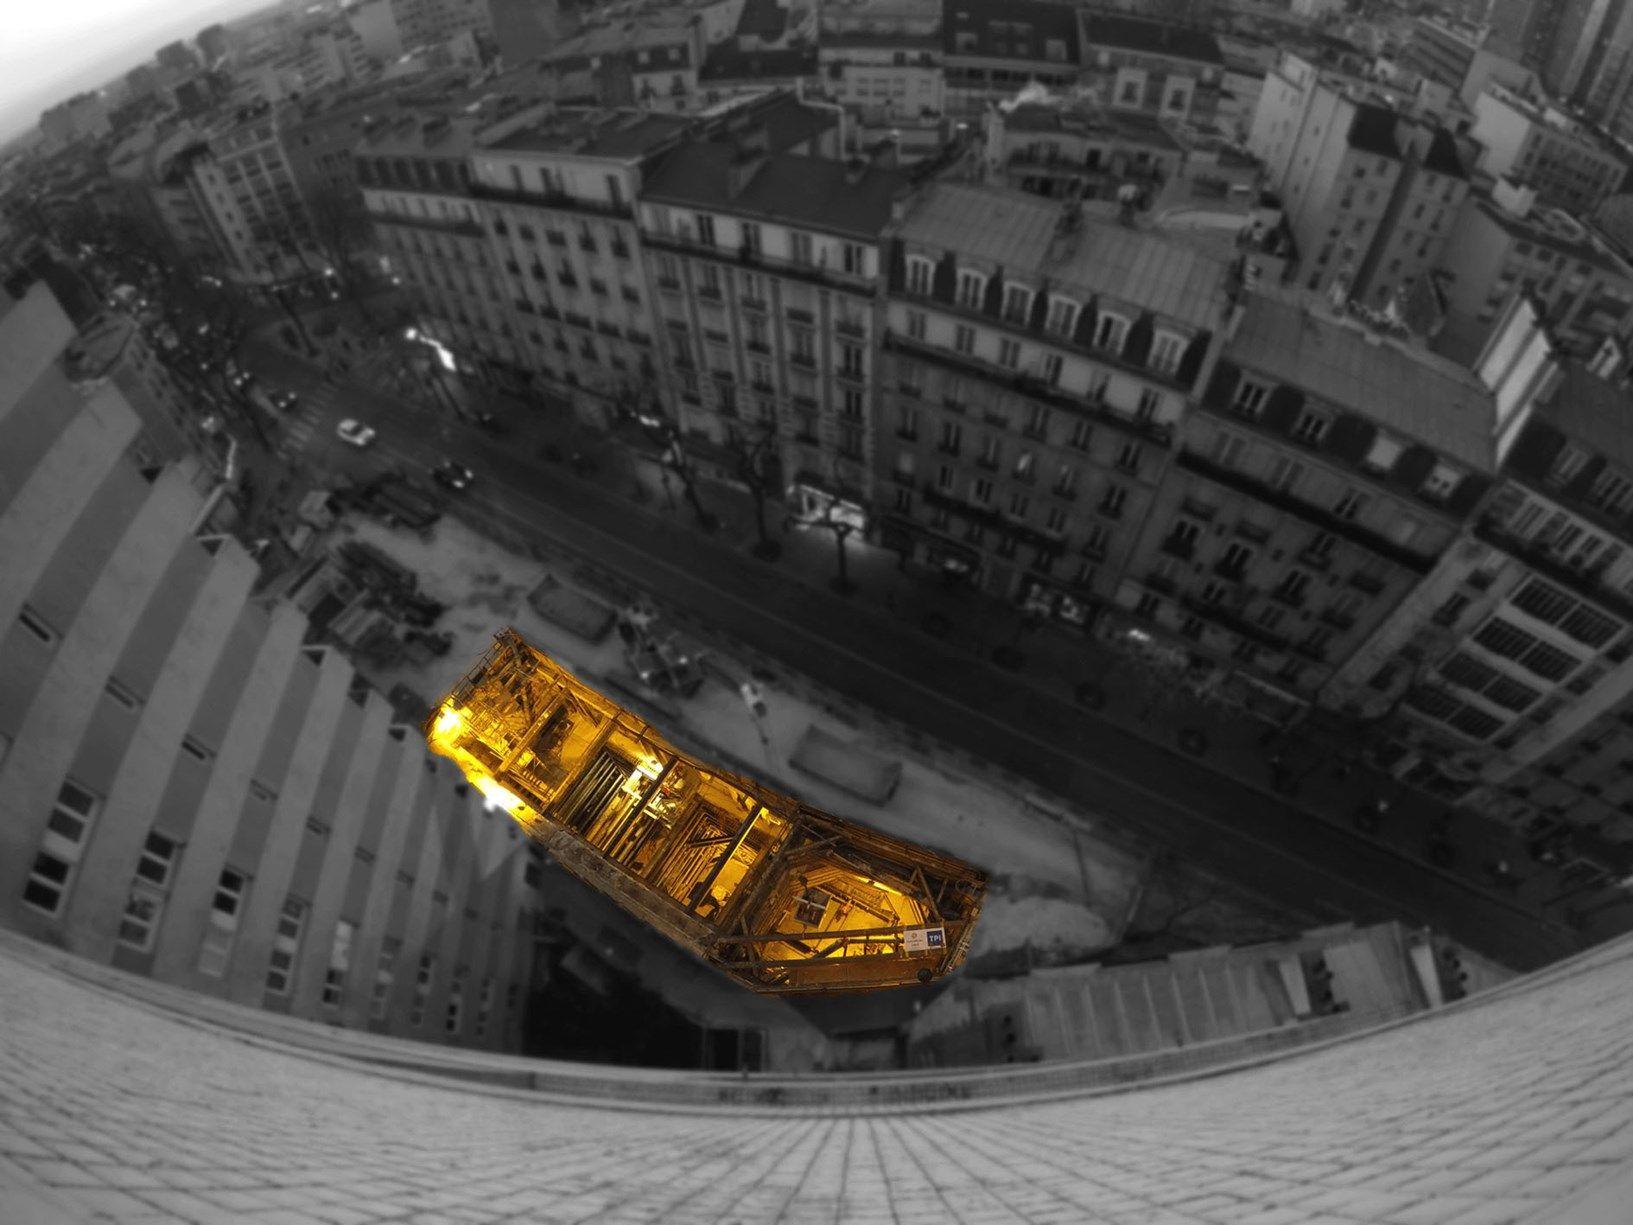 Tekla Porte E Finestre harpaceas: enser con tekla structures per la linea 11 della